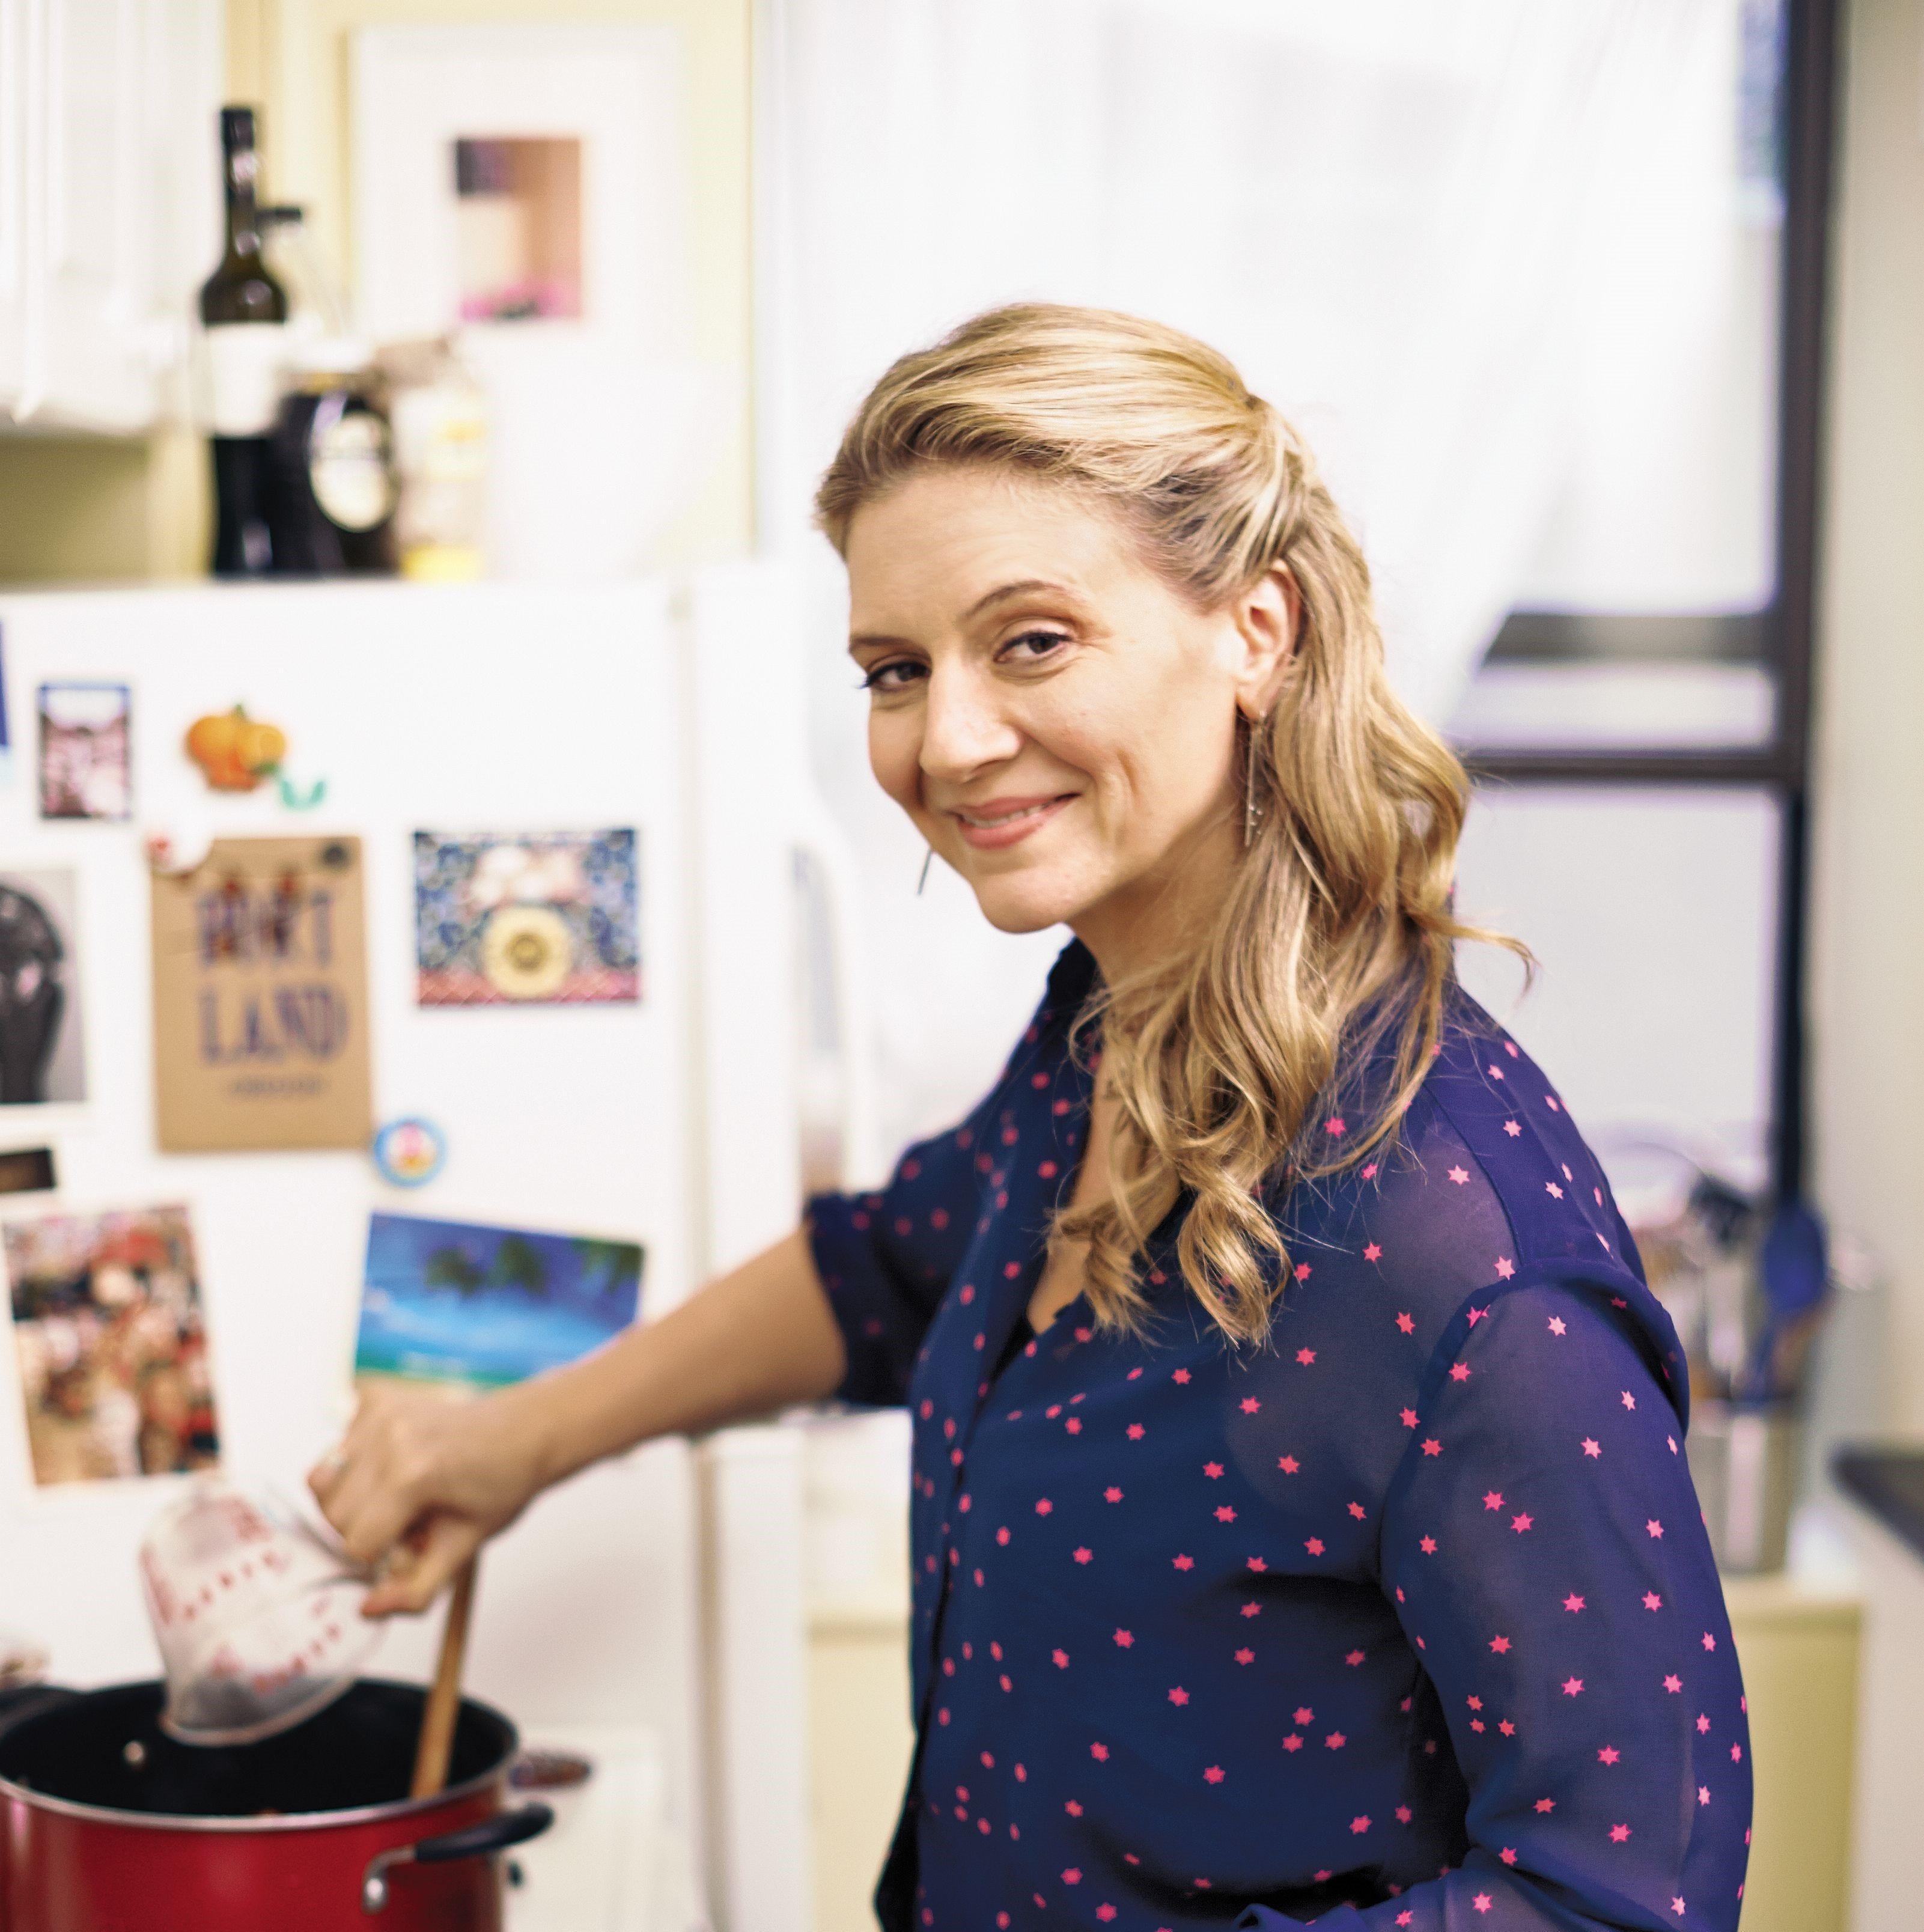 Amanda Freitag tells us what she'd put in a Wisconsin 'Chopped' basket